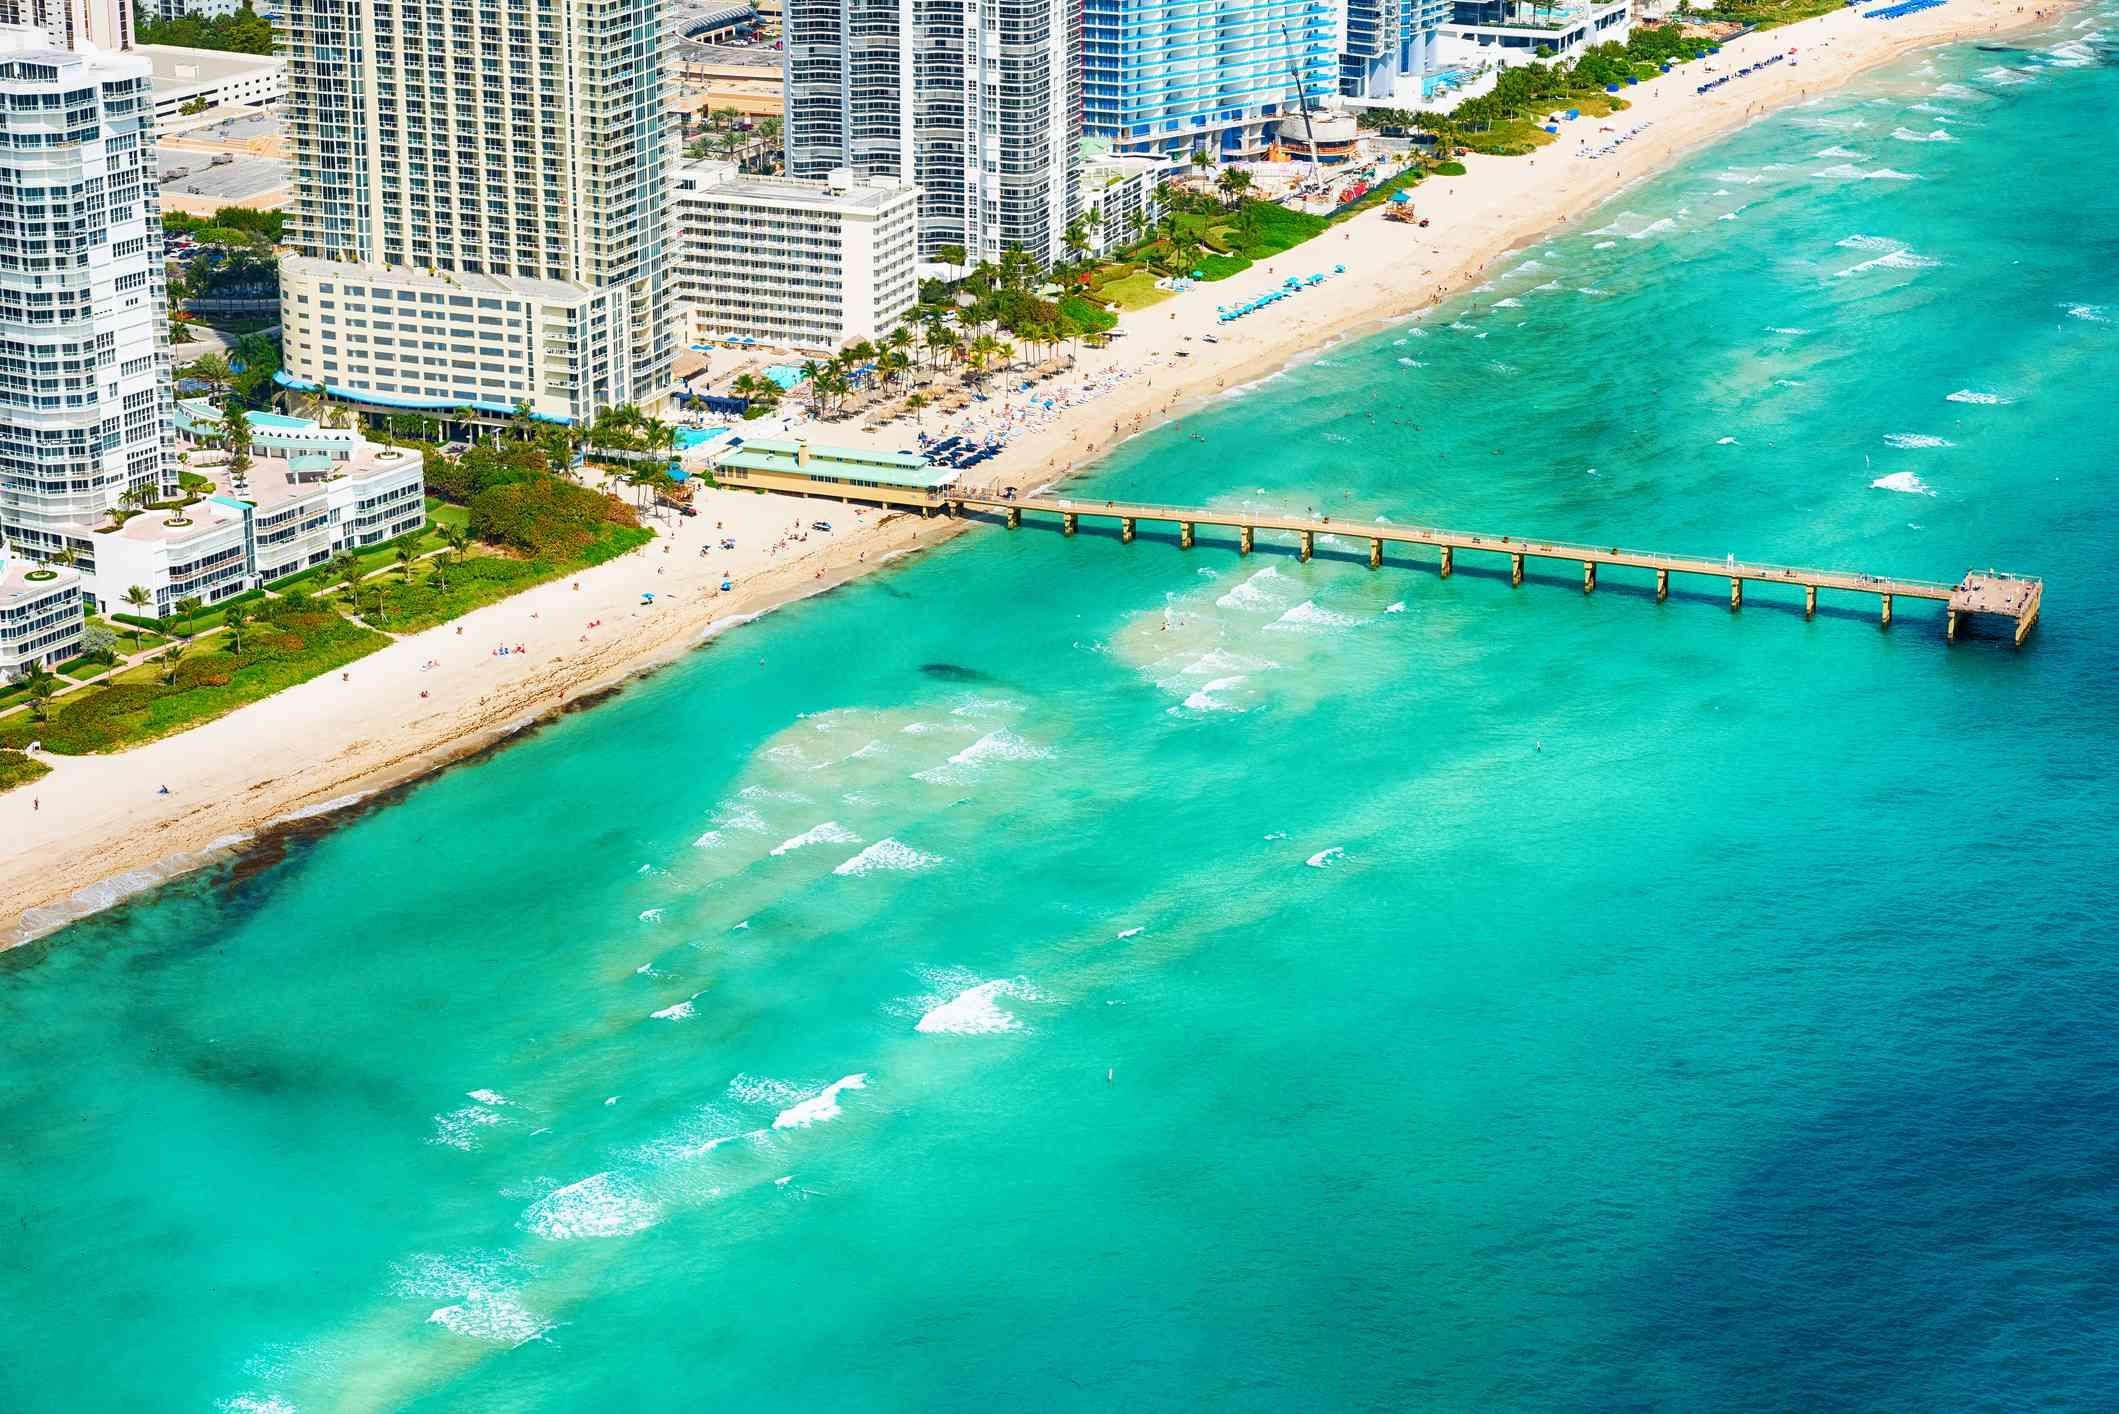 North Miami Beach Pier From Above